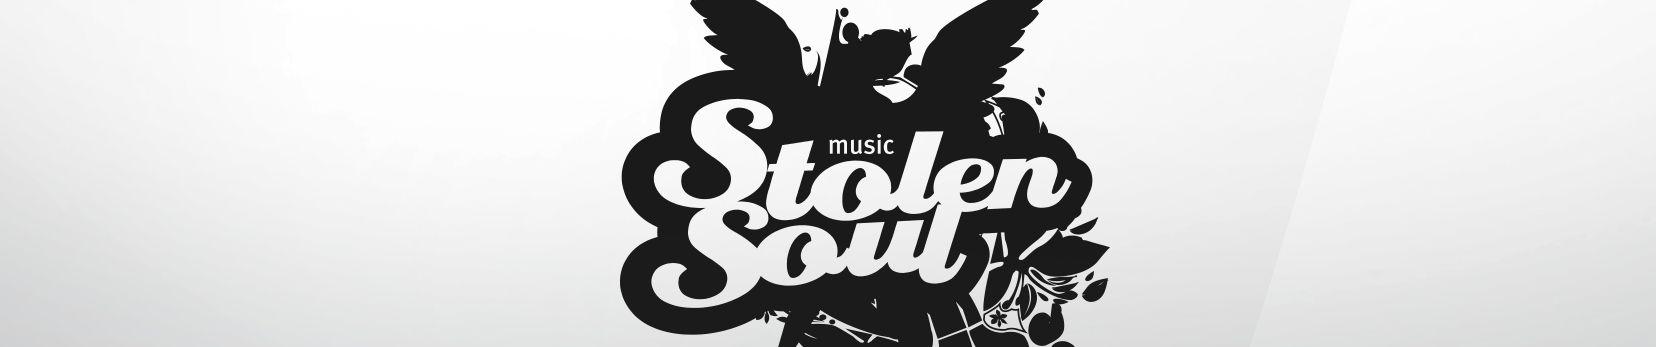 Electriksoul ⚡️   Free Listening on SoundCloud